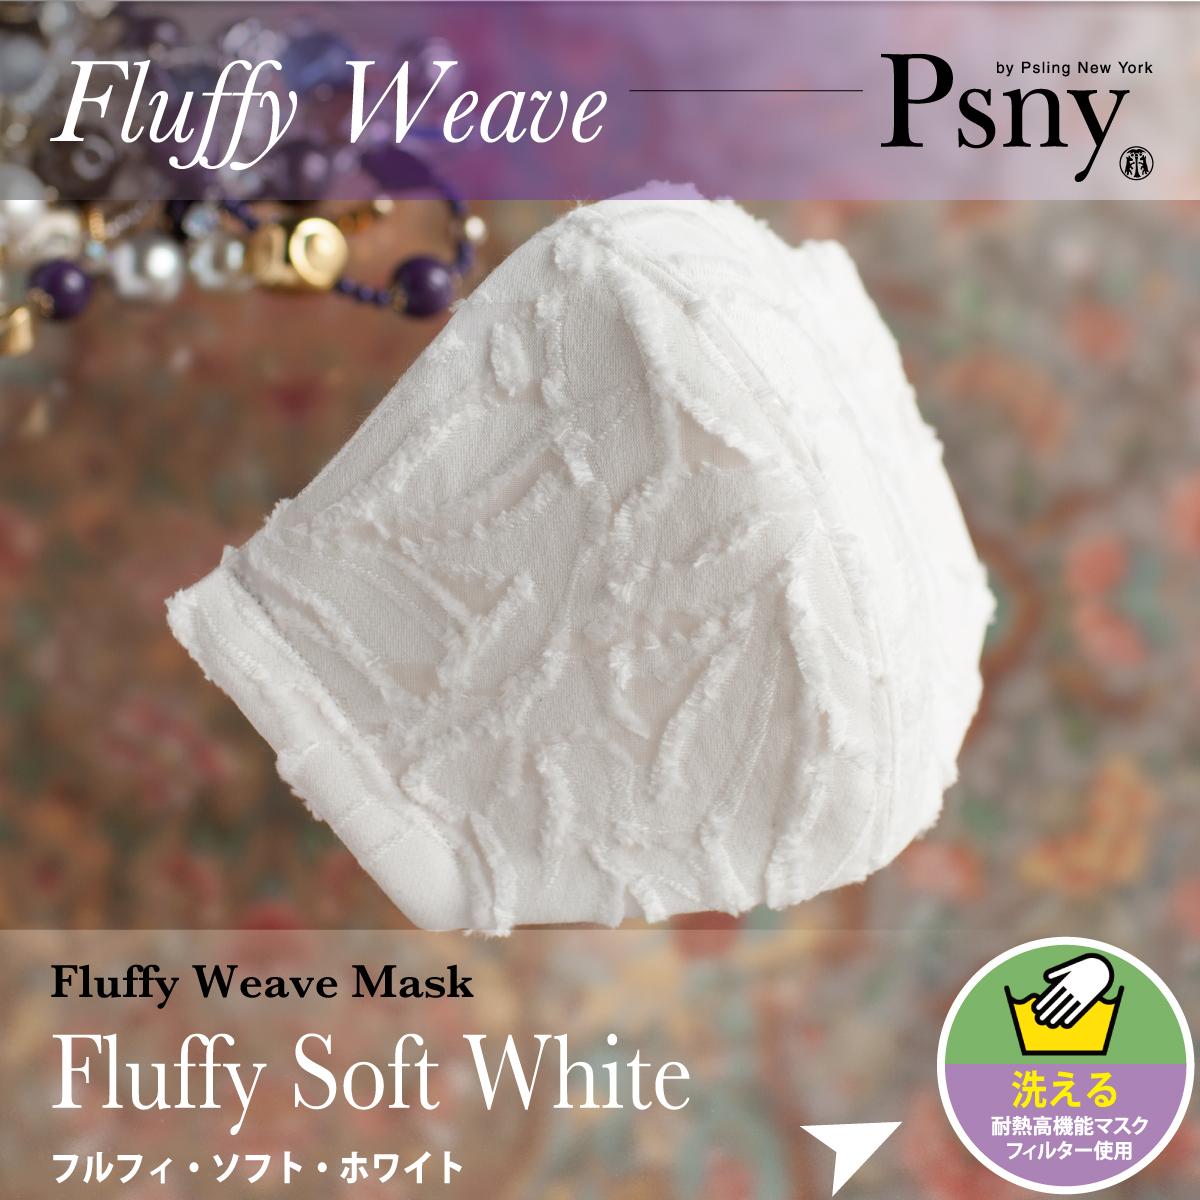 PSNY フルフィ・ソフト ホワイト 花粉 黄砂 洗えるフィルター入り 立体 マスク 大人用